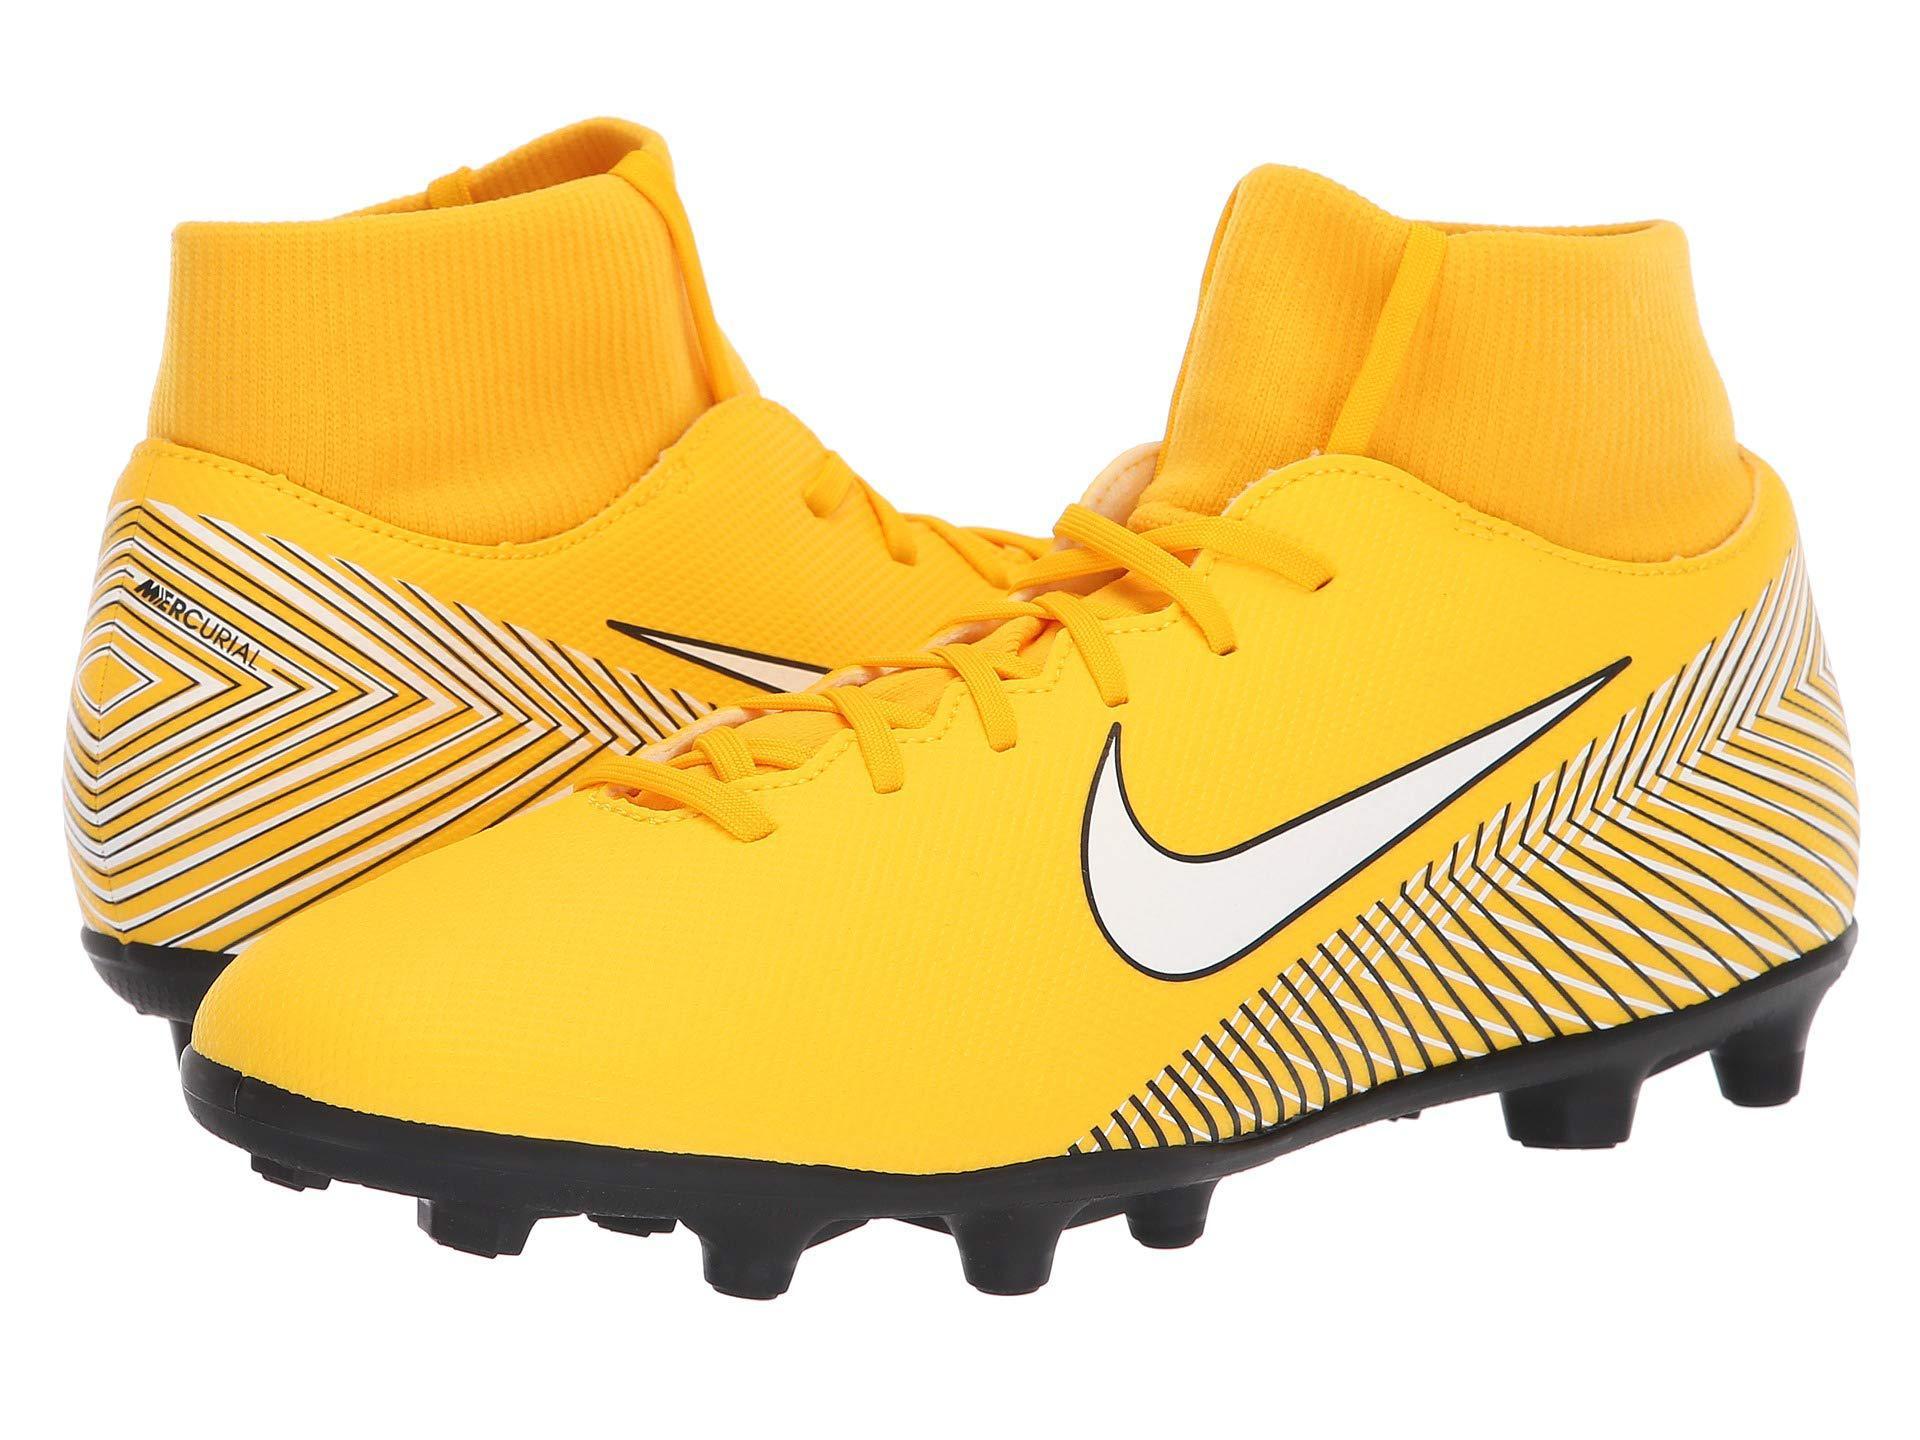 ff199f975e4 Nike - Yellow Superfly 6 Club Njr Mg for Men - Lyst. View fullscreen